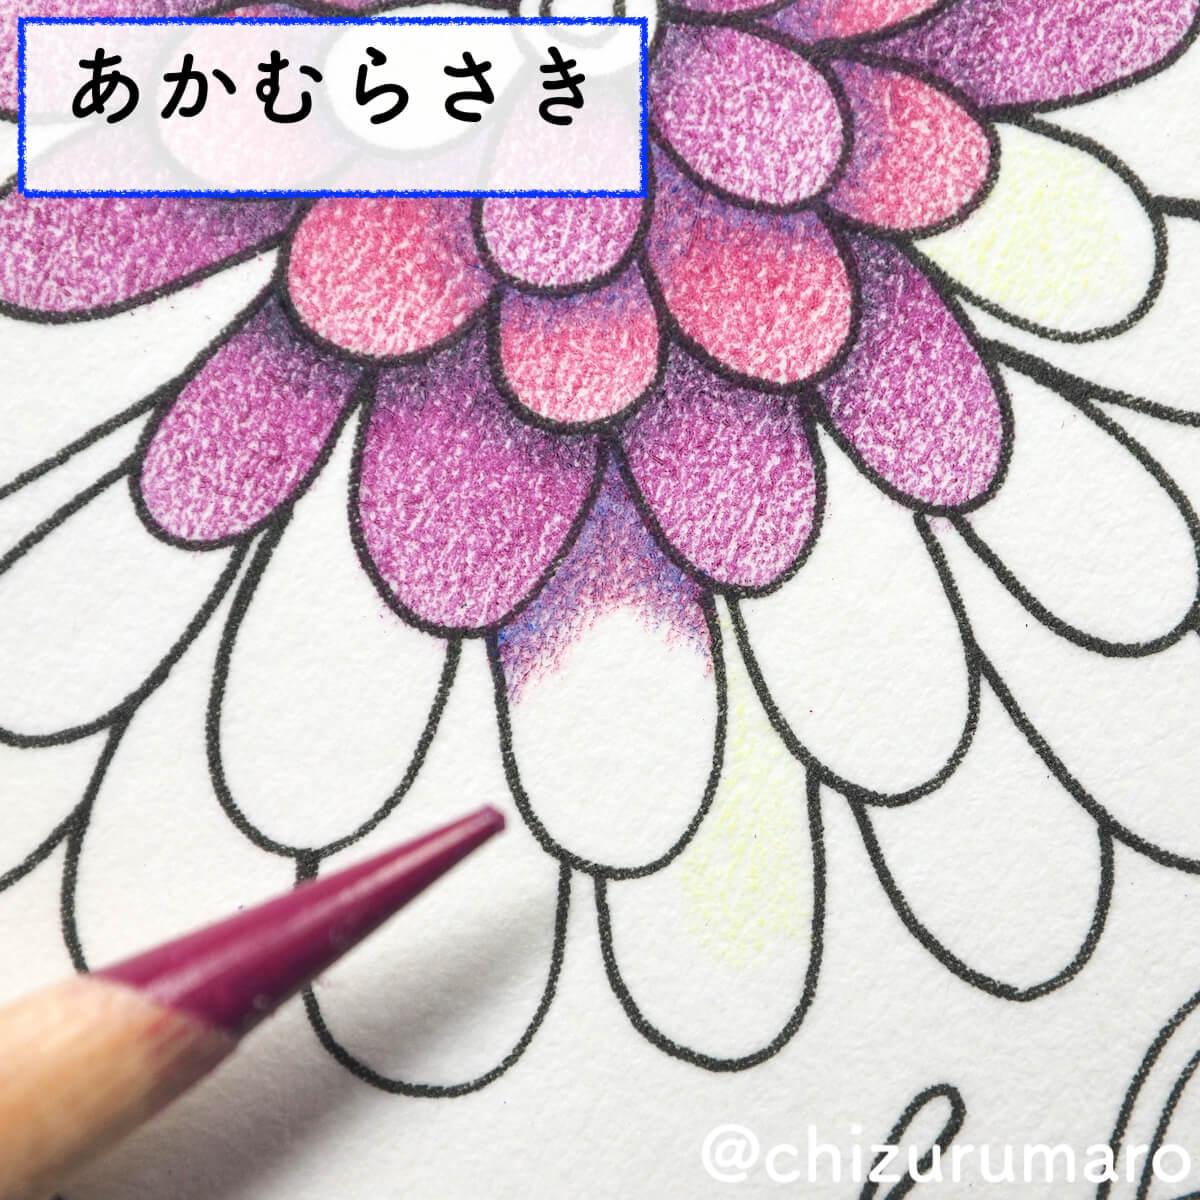 f:id:chizurumaro:20200415164344j:plain